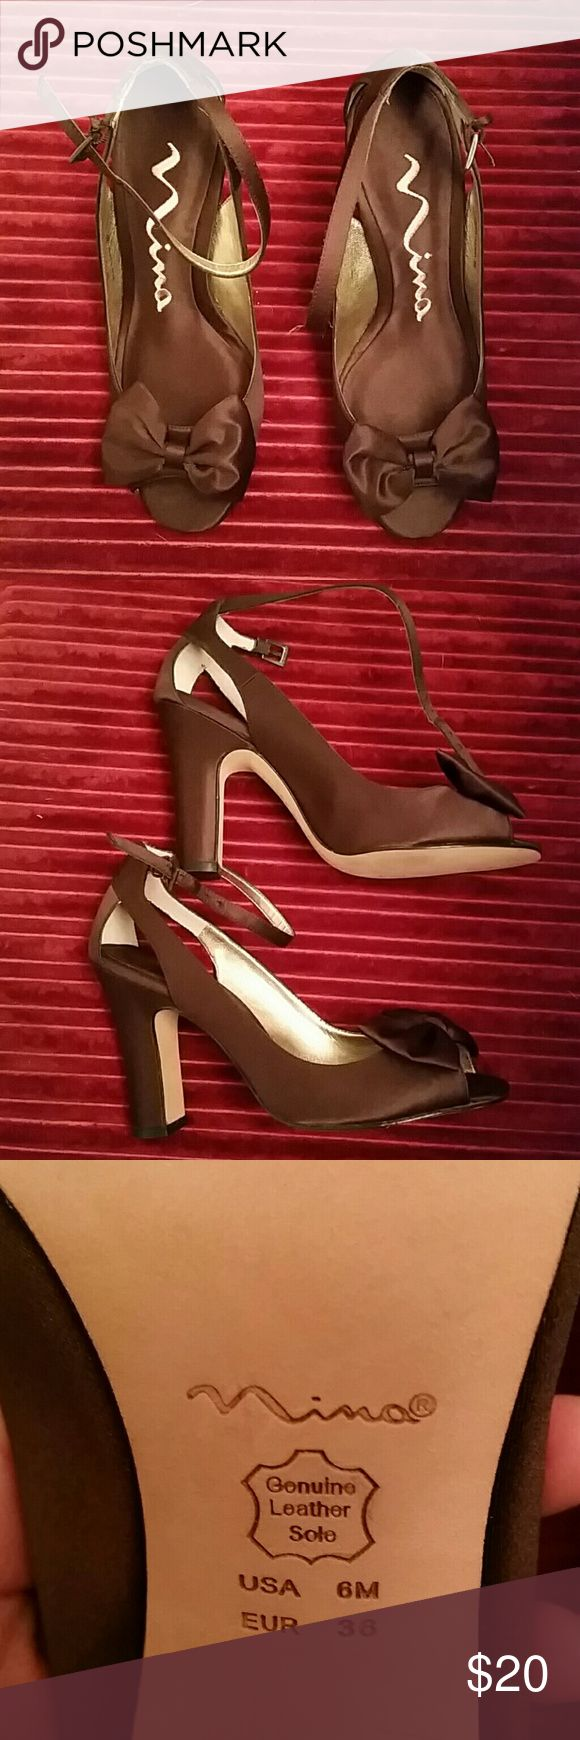 Brand new,  never worn dressy heels Brown satin heels by Nina Nina Shoes Heels